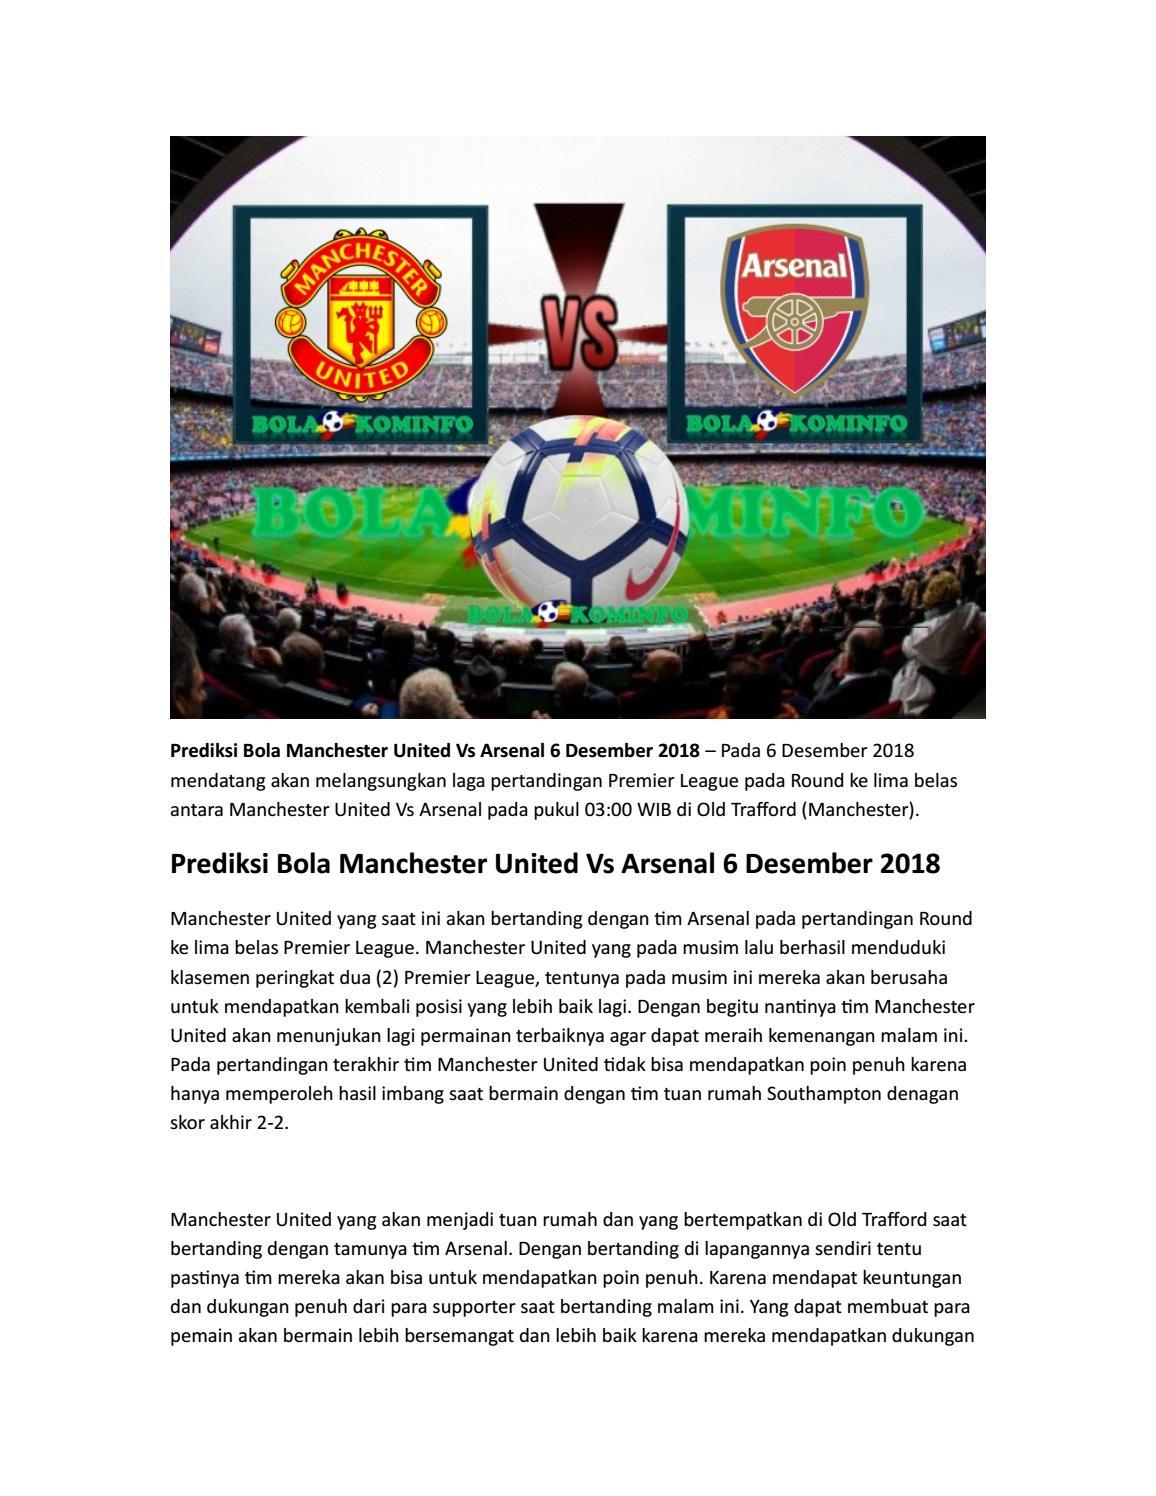 Prediksi Bola Manchester United Vs Arsenal 6 Desember 2018